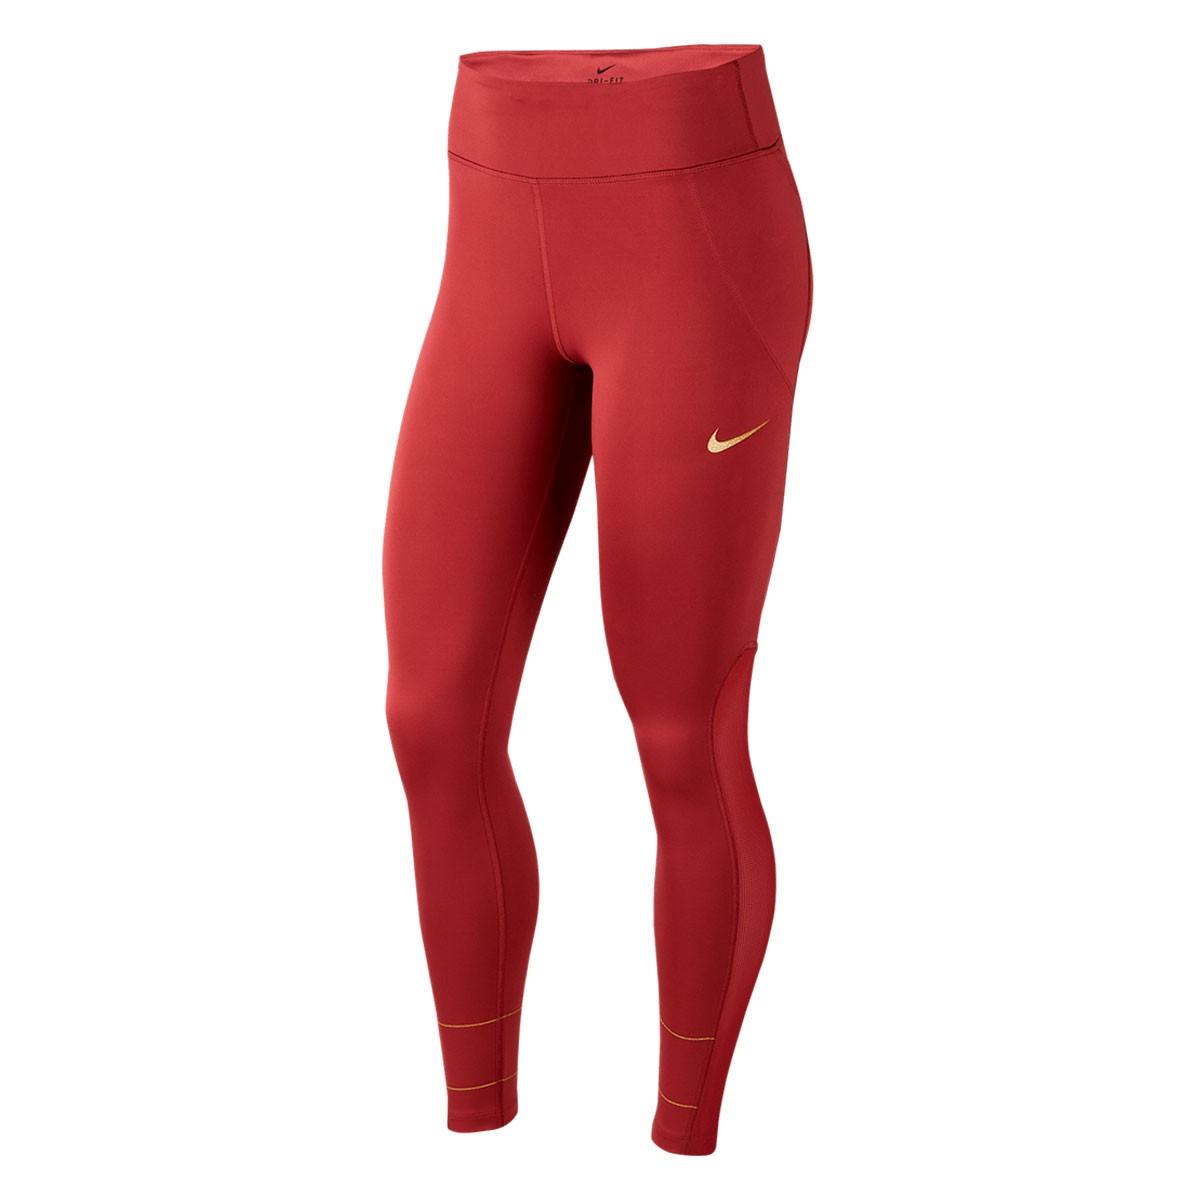 Calça Nike Fast Tight Glam Dunk Feminino Vermelho